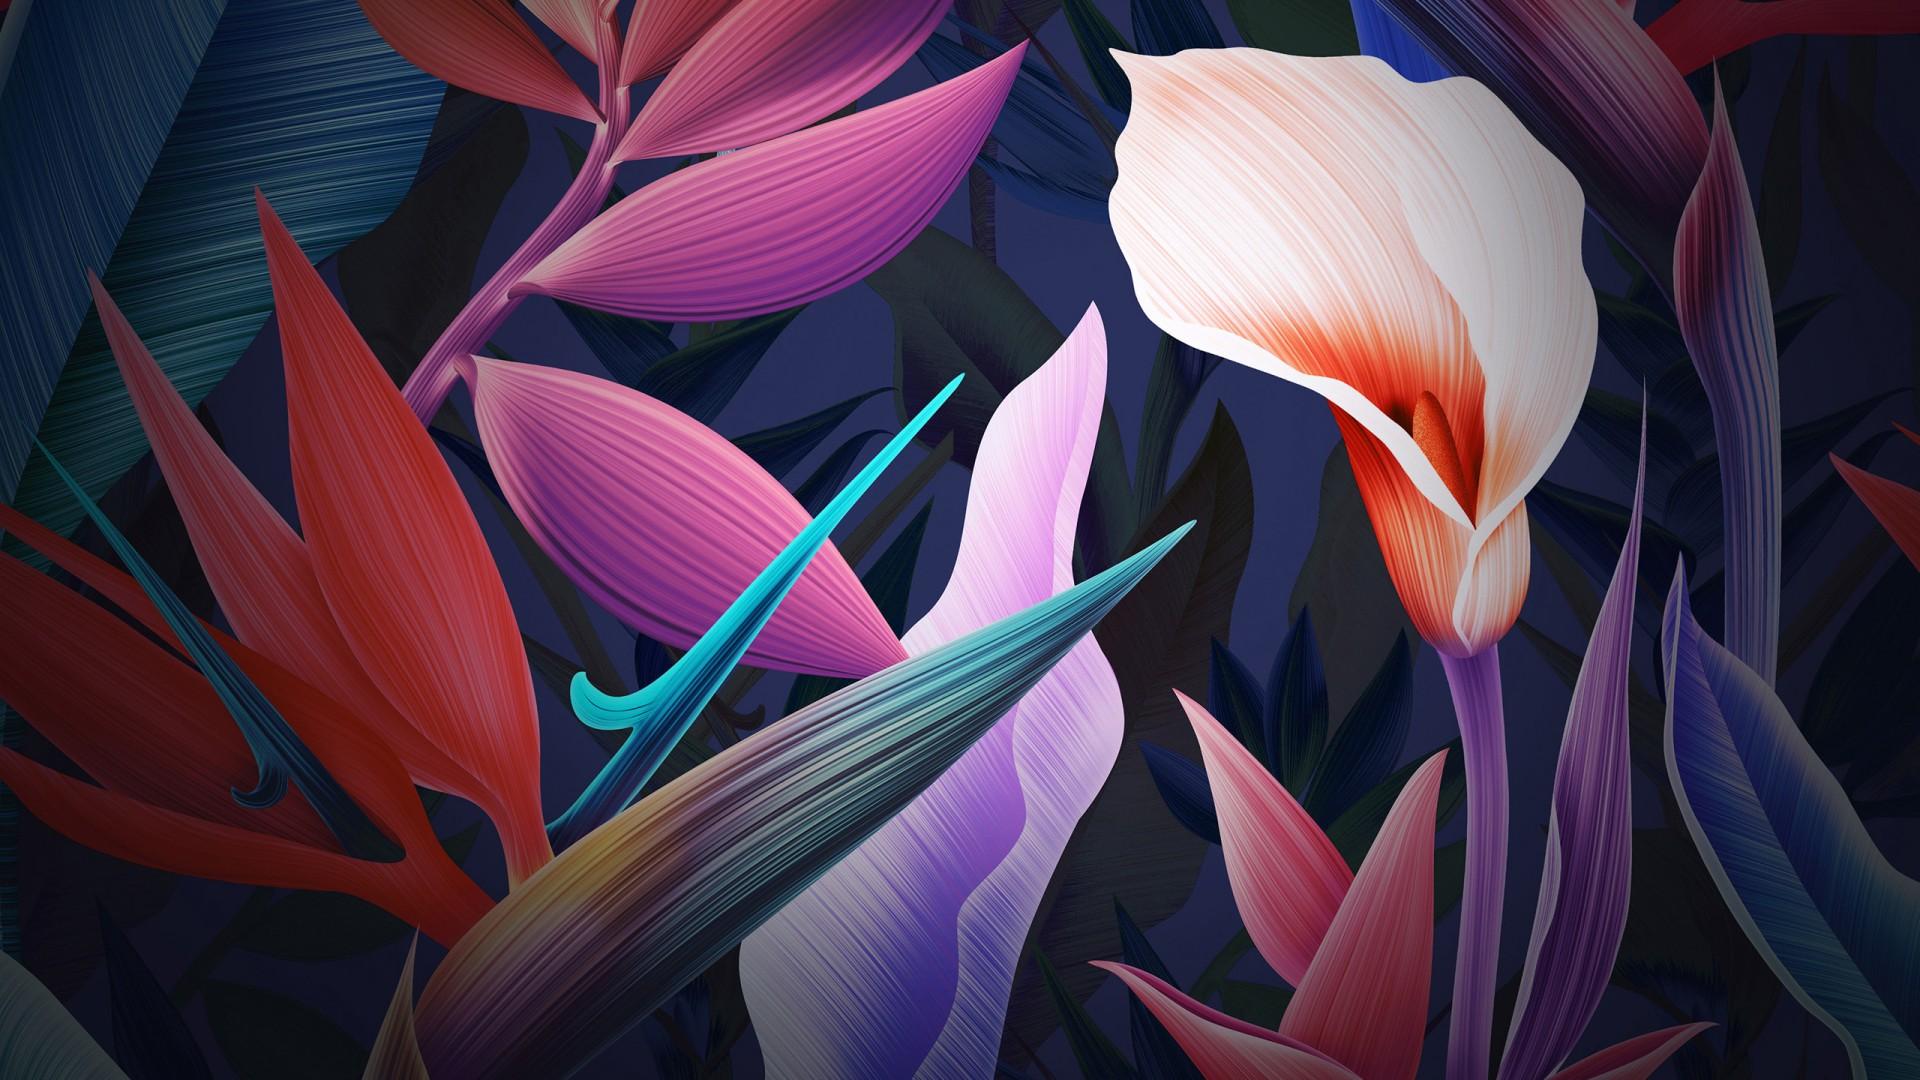 Cute Owl Iphone Wallpaper Neon Flowers Huawei Mate 10 Stock Wallpapers Hd